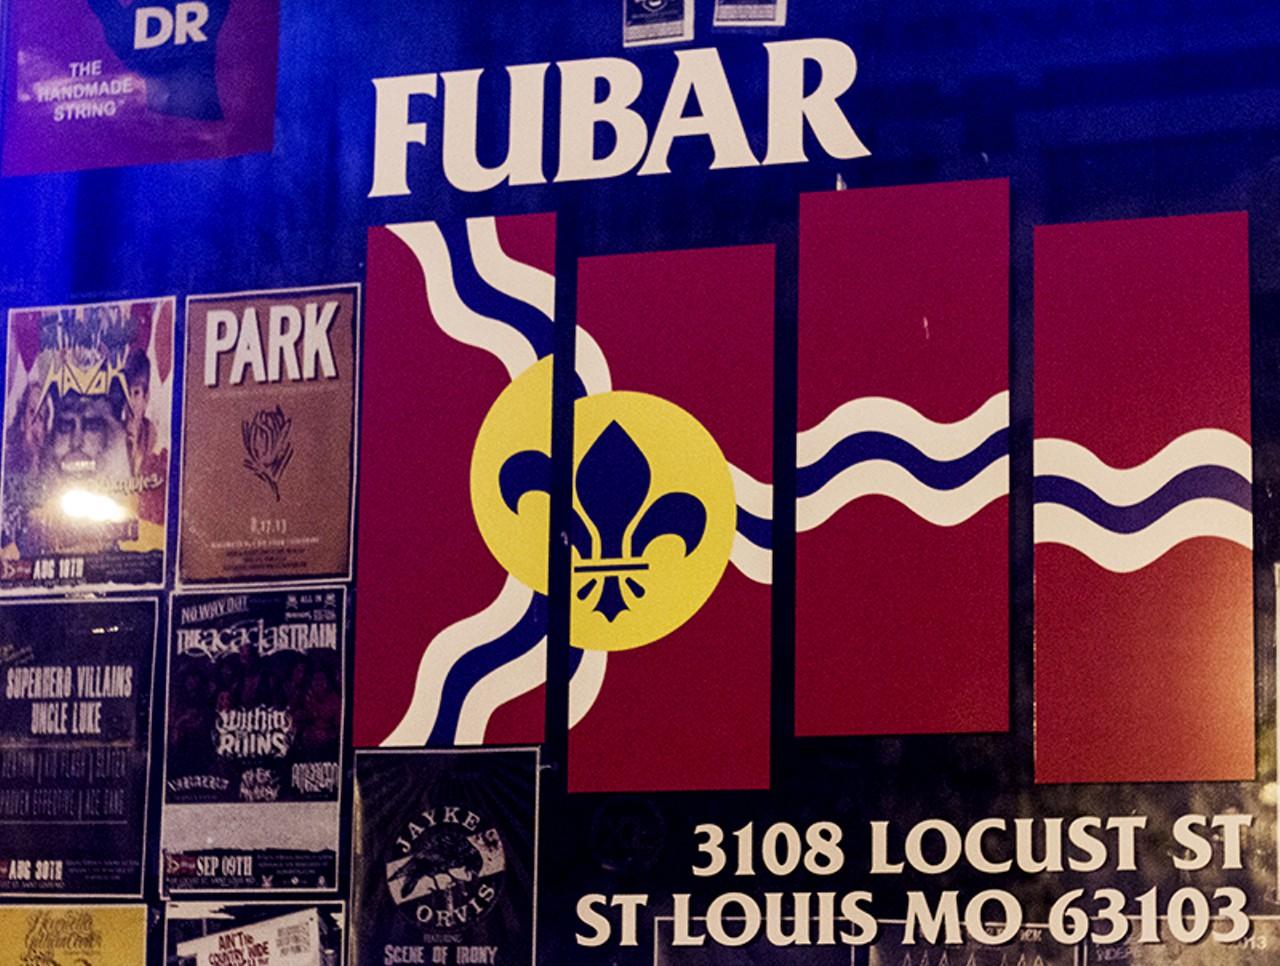 fubar st louis midtown bars and clubs music venues music nightlife. Black Bedroom Furniture Sets. Home Design Ideas